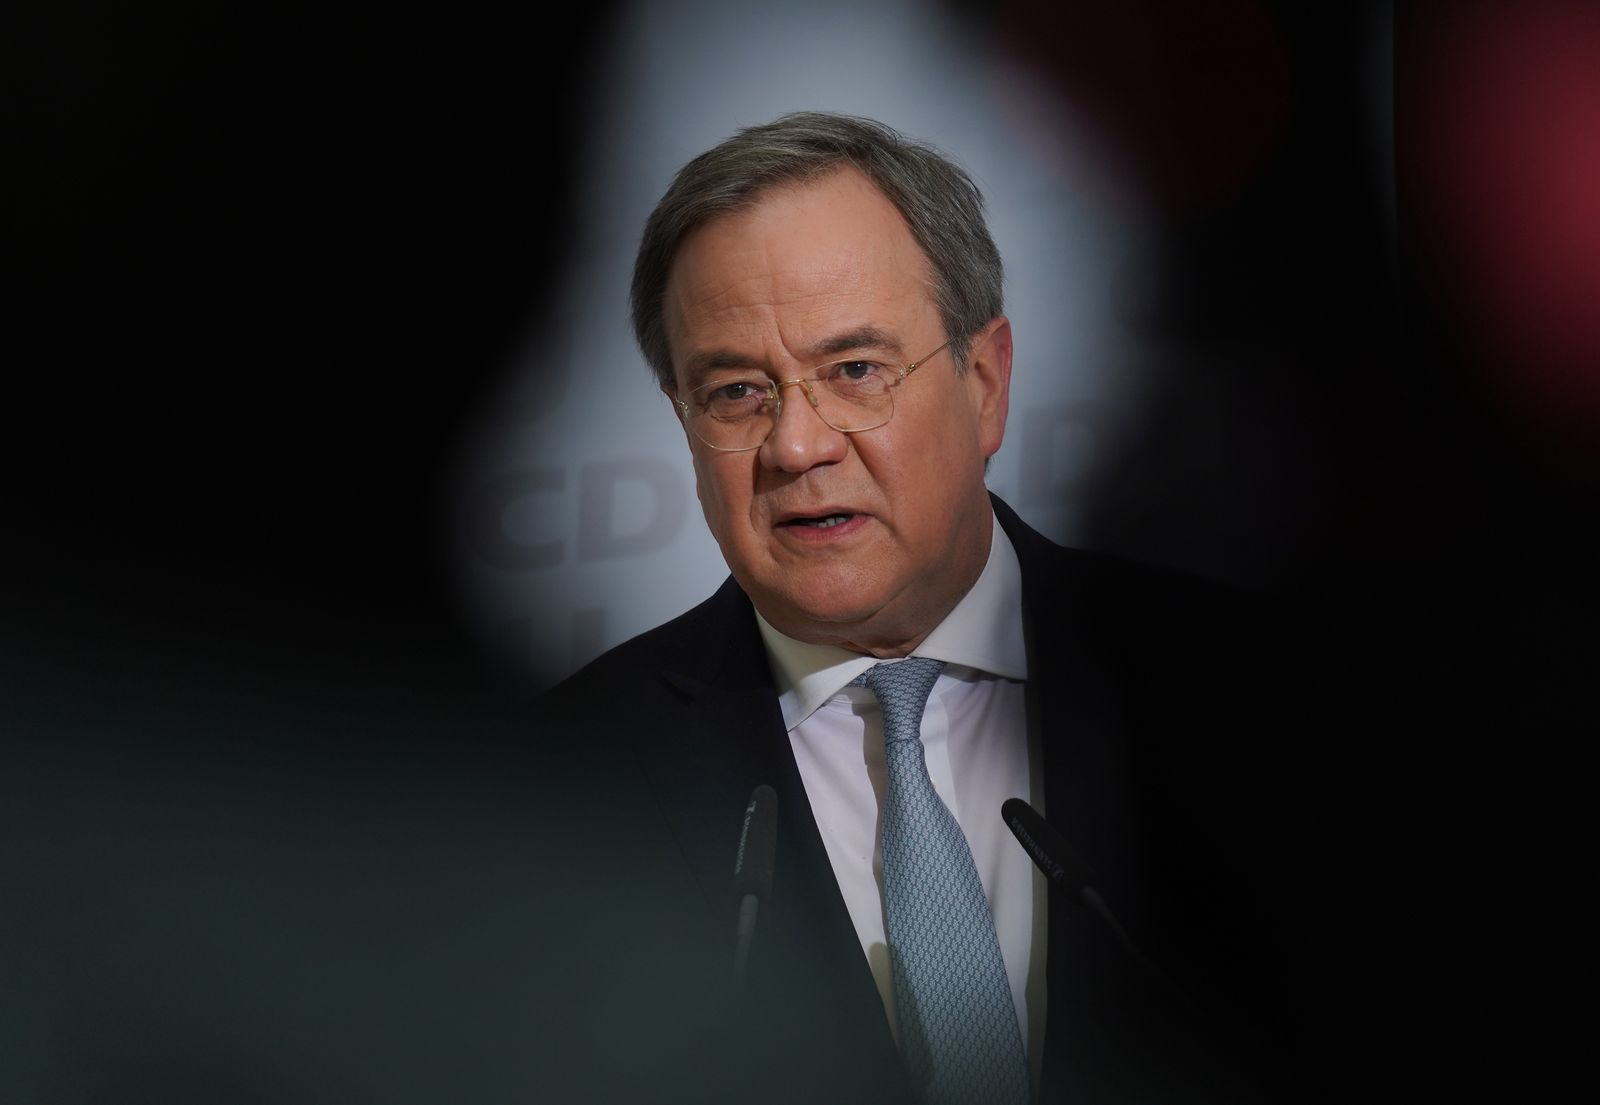 CDU Leadership Confirms Armin Laschet As Chancellor Candidate